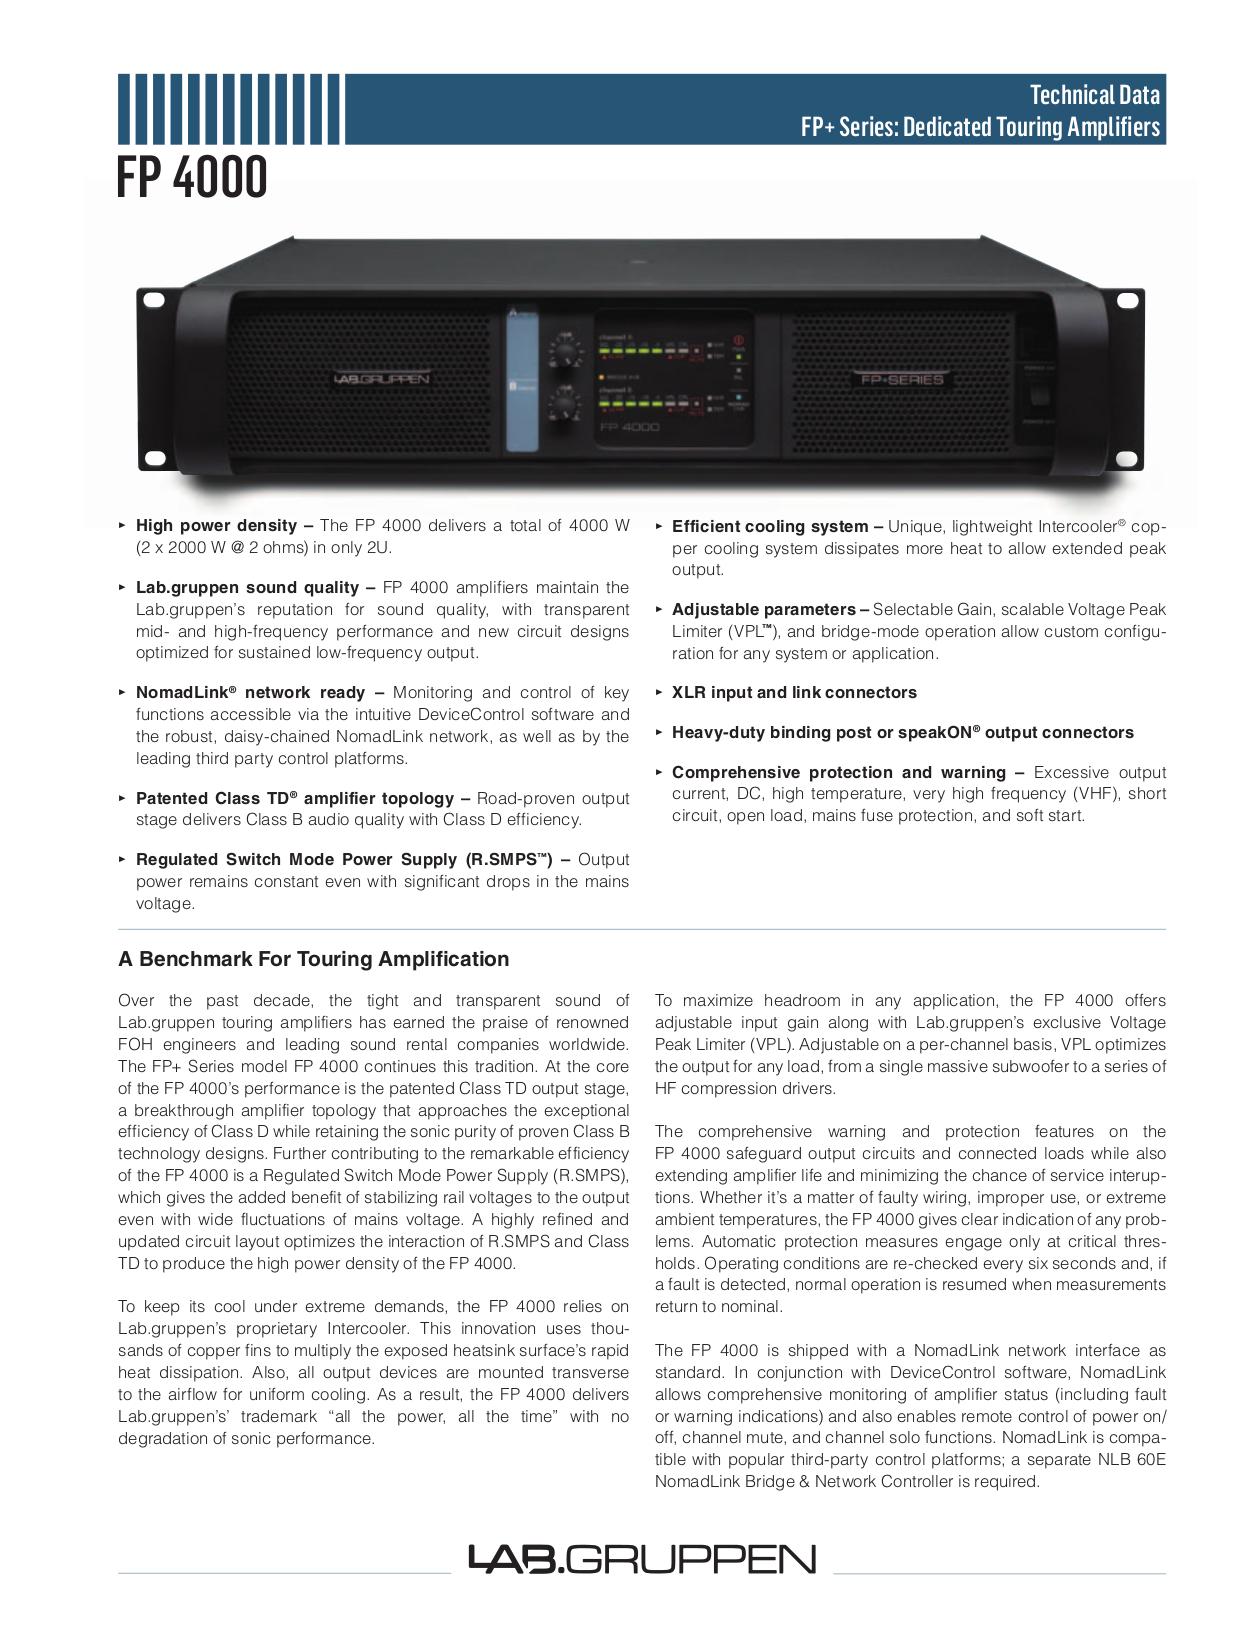 domino a series plus manual pdf